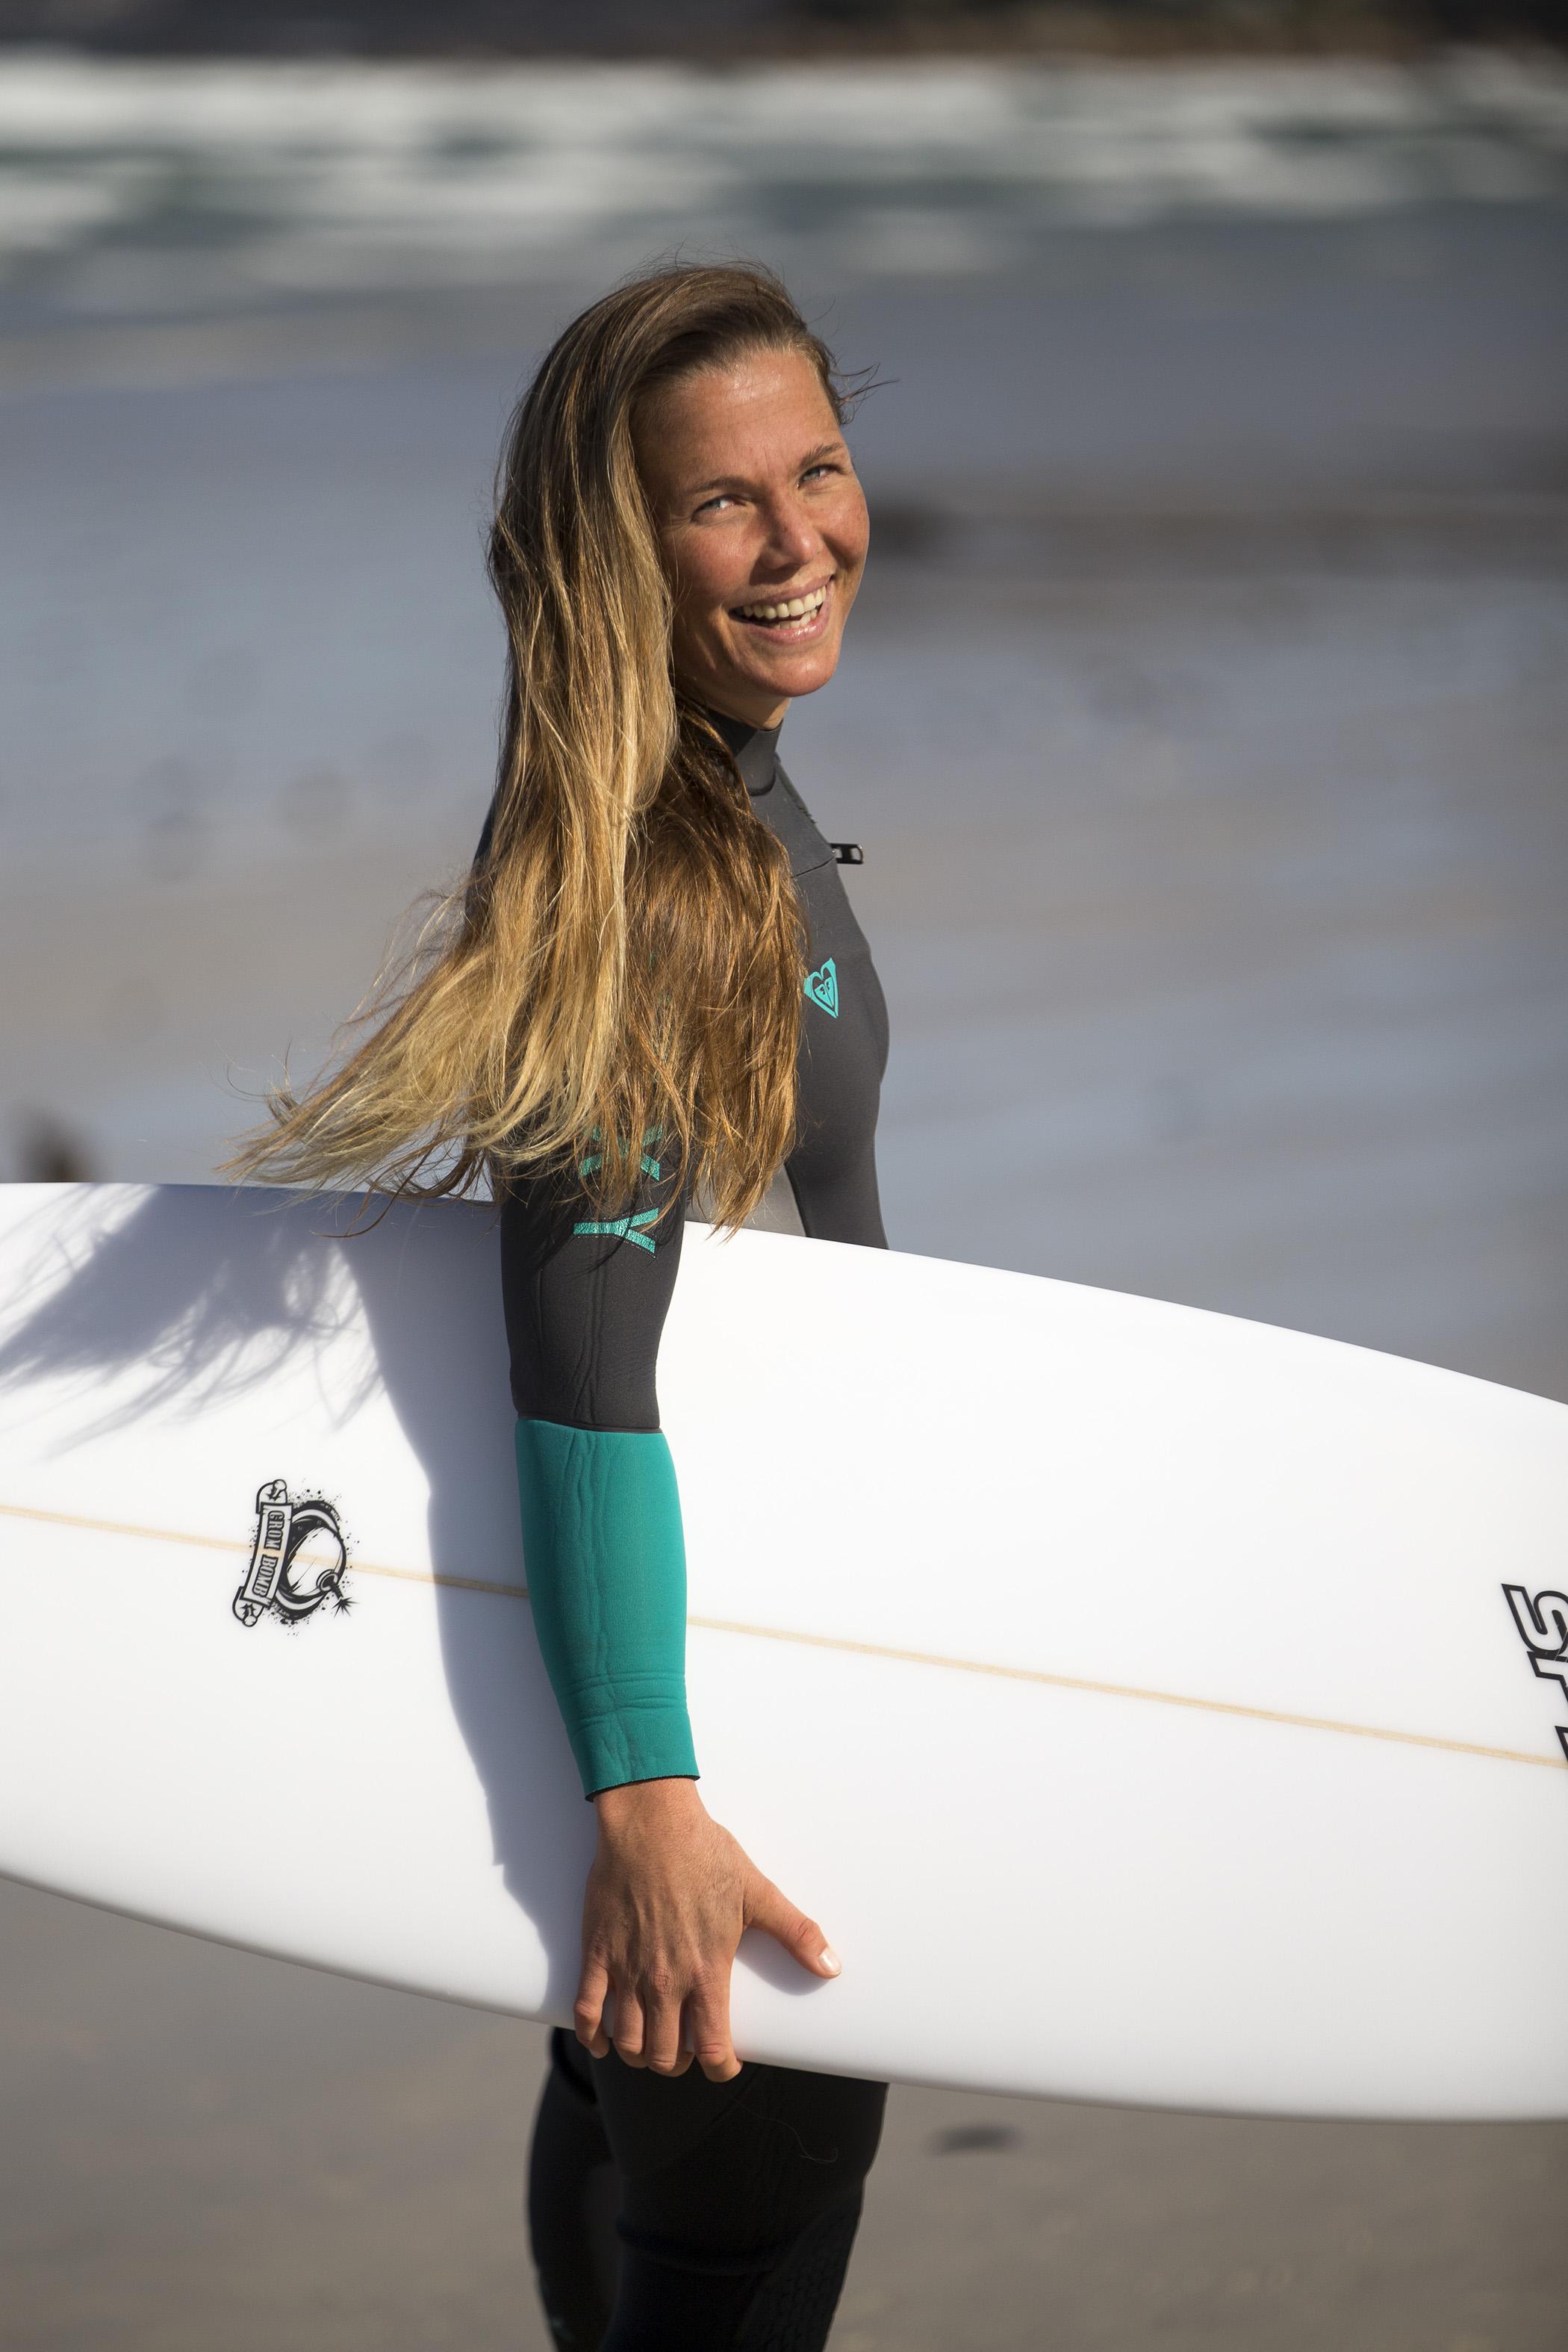 Roxy Davis holding a white surfboard